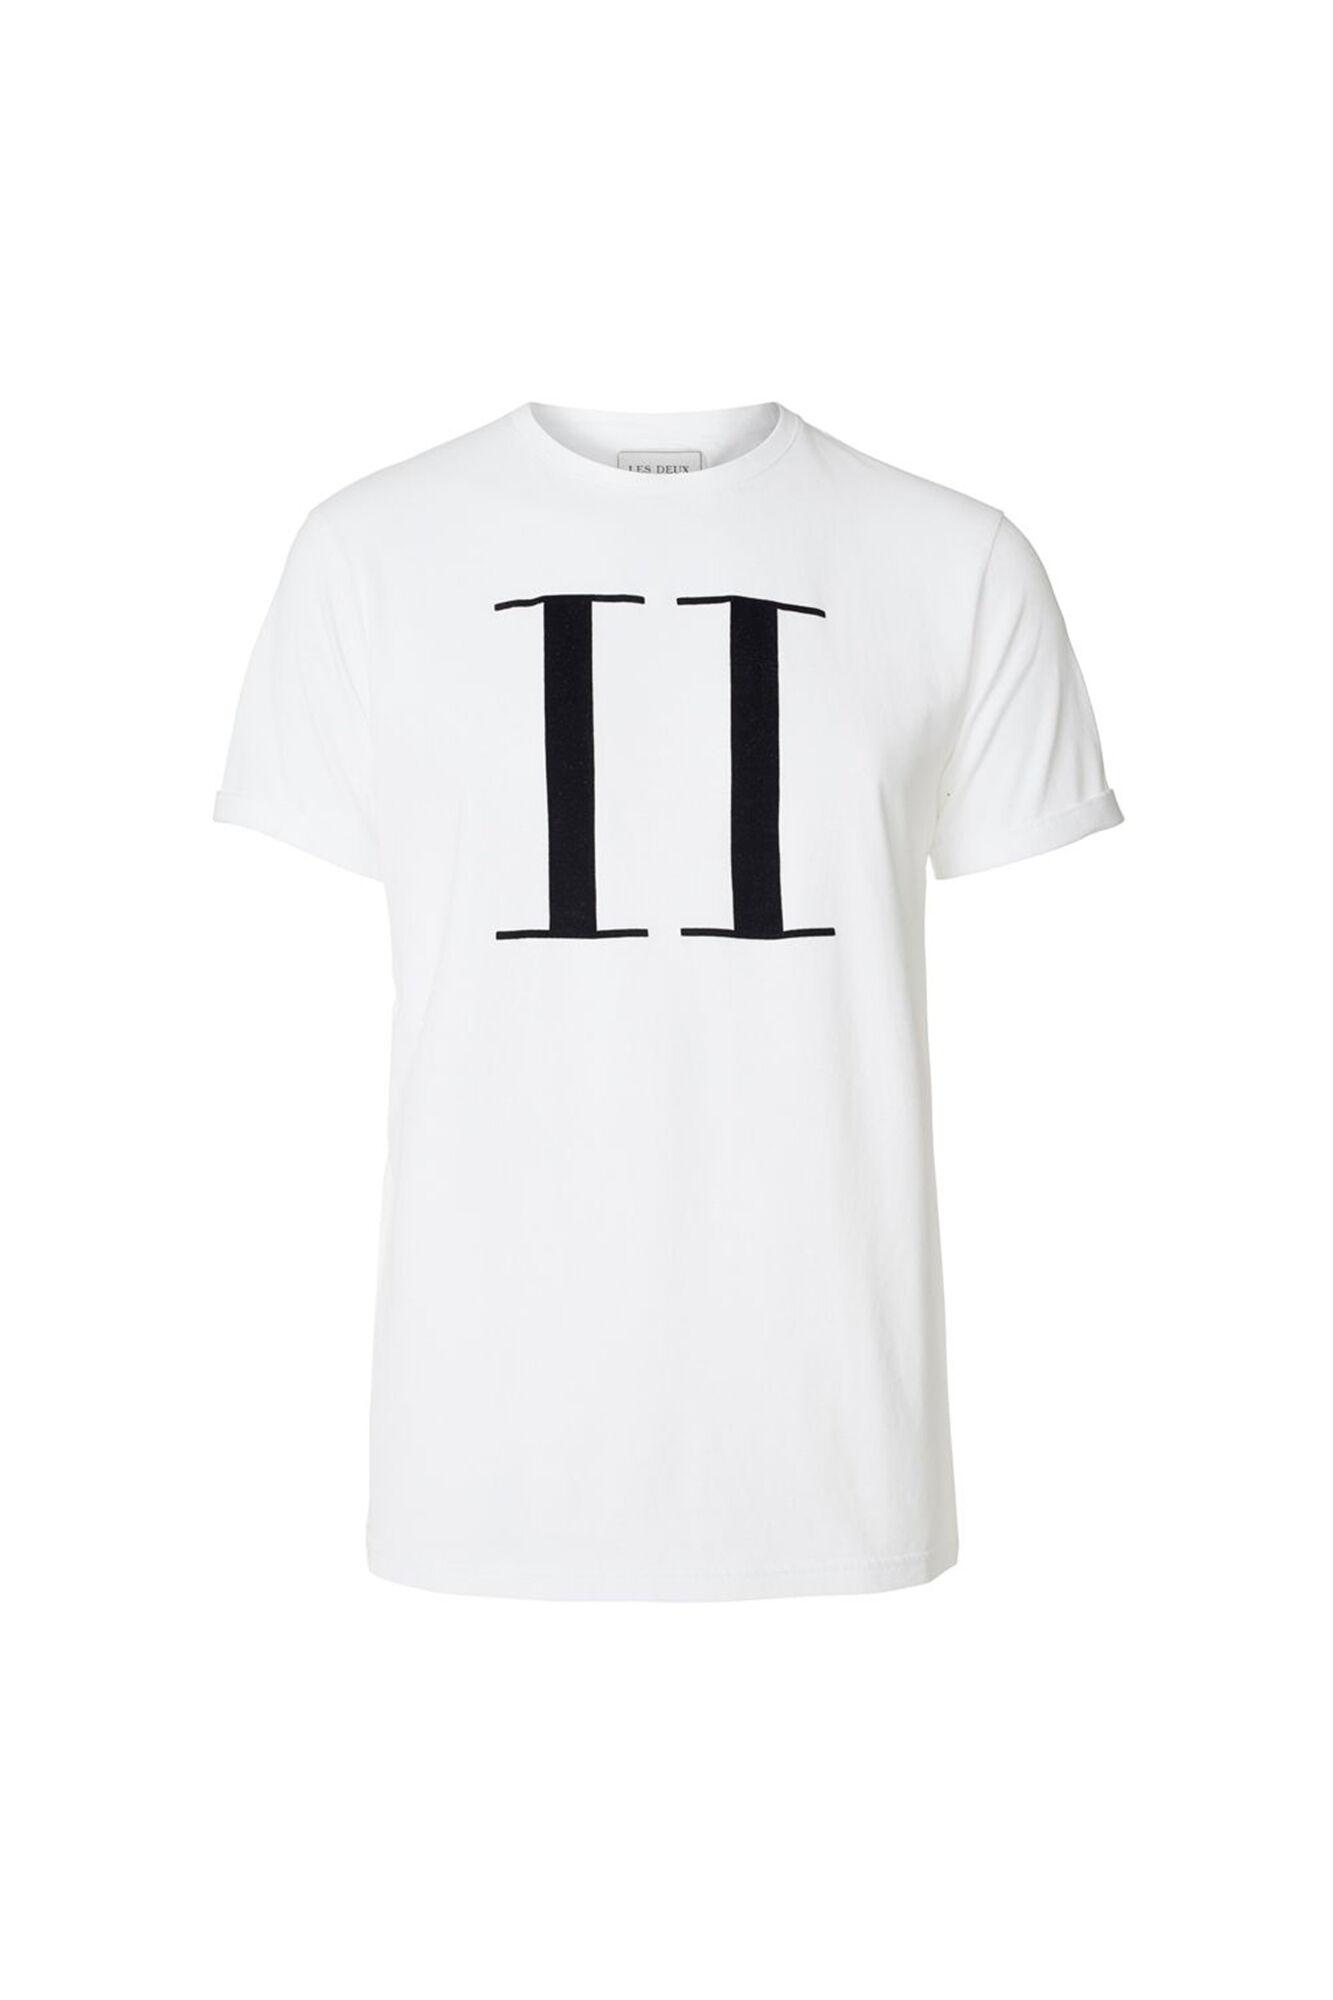 Encore T-shirt LDM101006, WHITE/BLACK